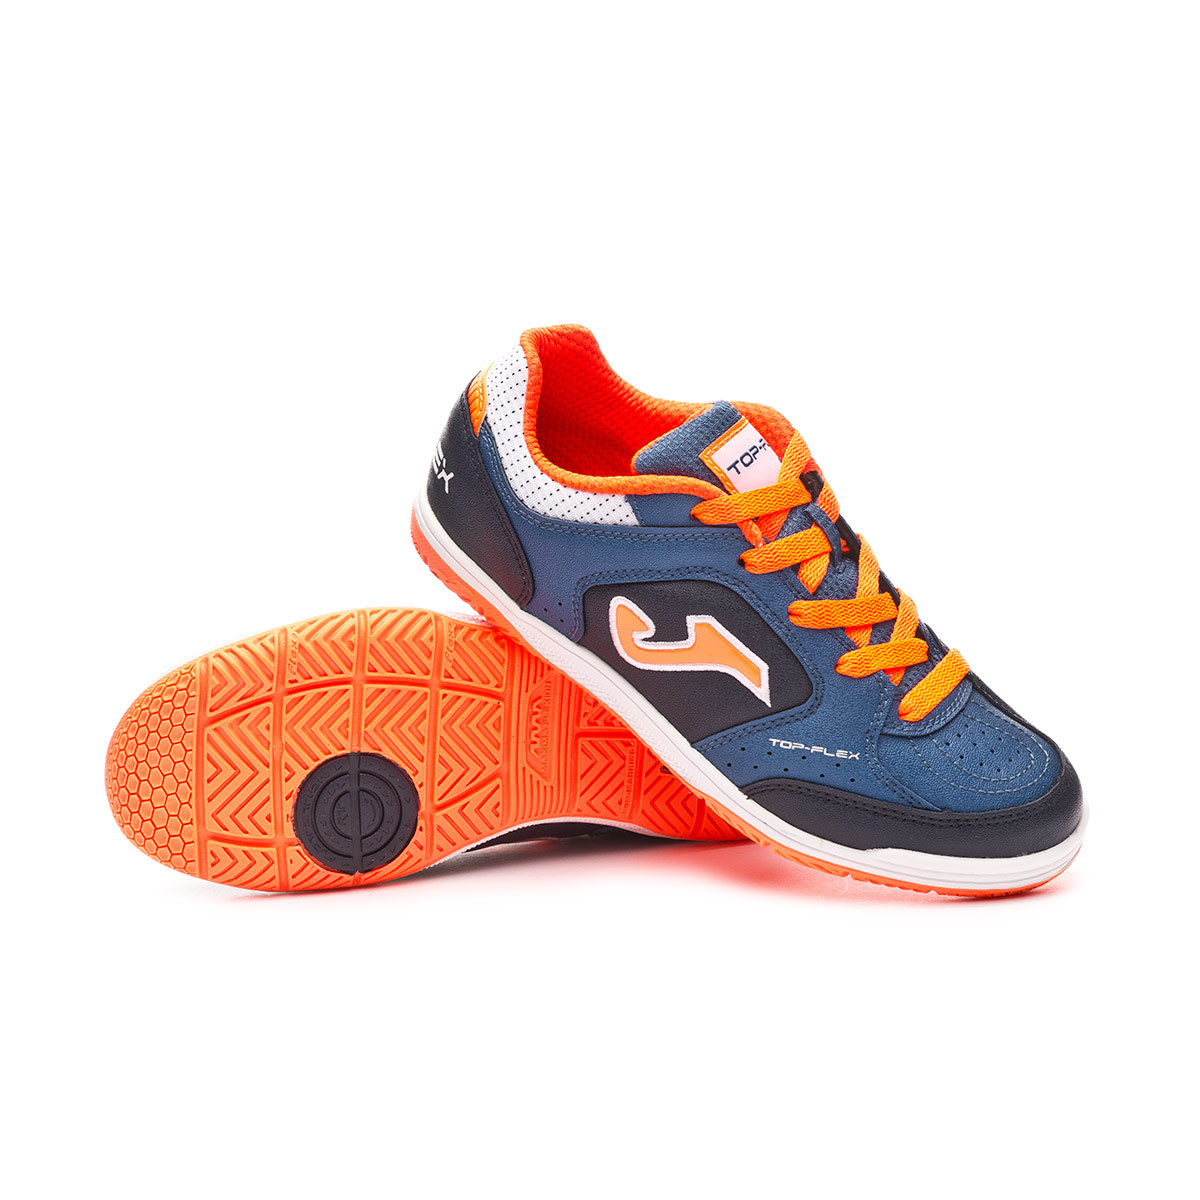 buy online 412ce 03016 Scarpe Joma Top Flex Niño